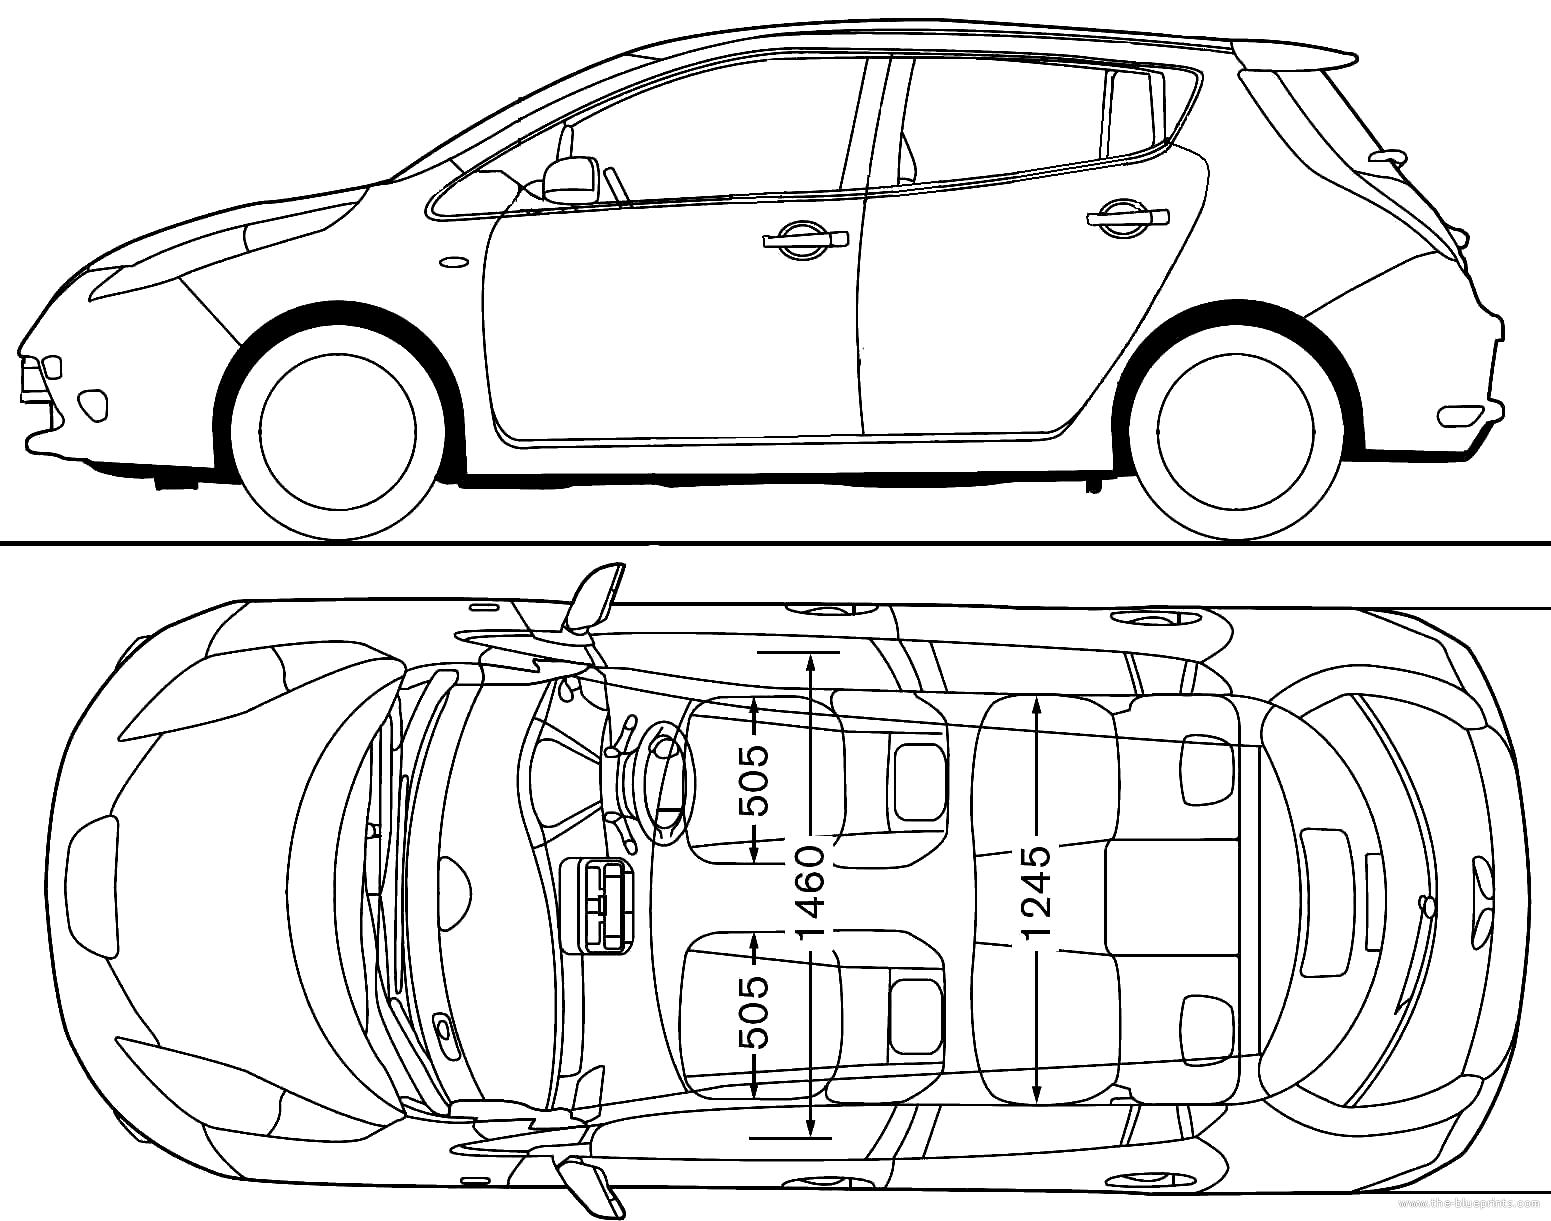 The blueprints blueprints cars nissan nissan leaf 2011 nissan leaf 2011 vanachro Choice Image